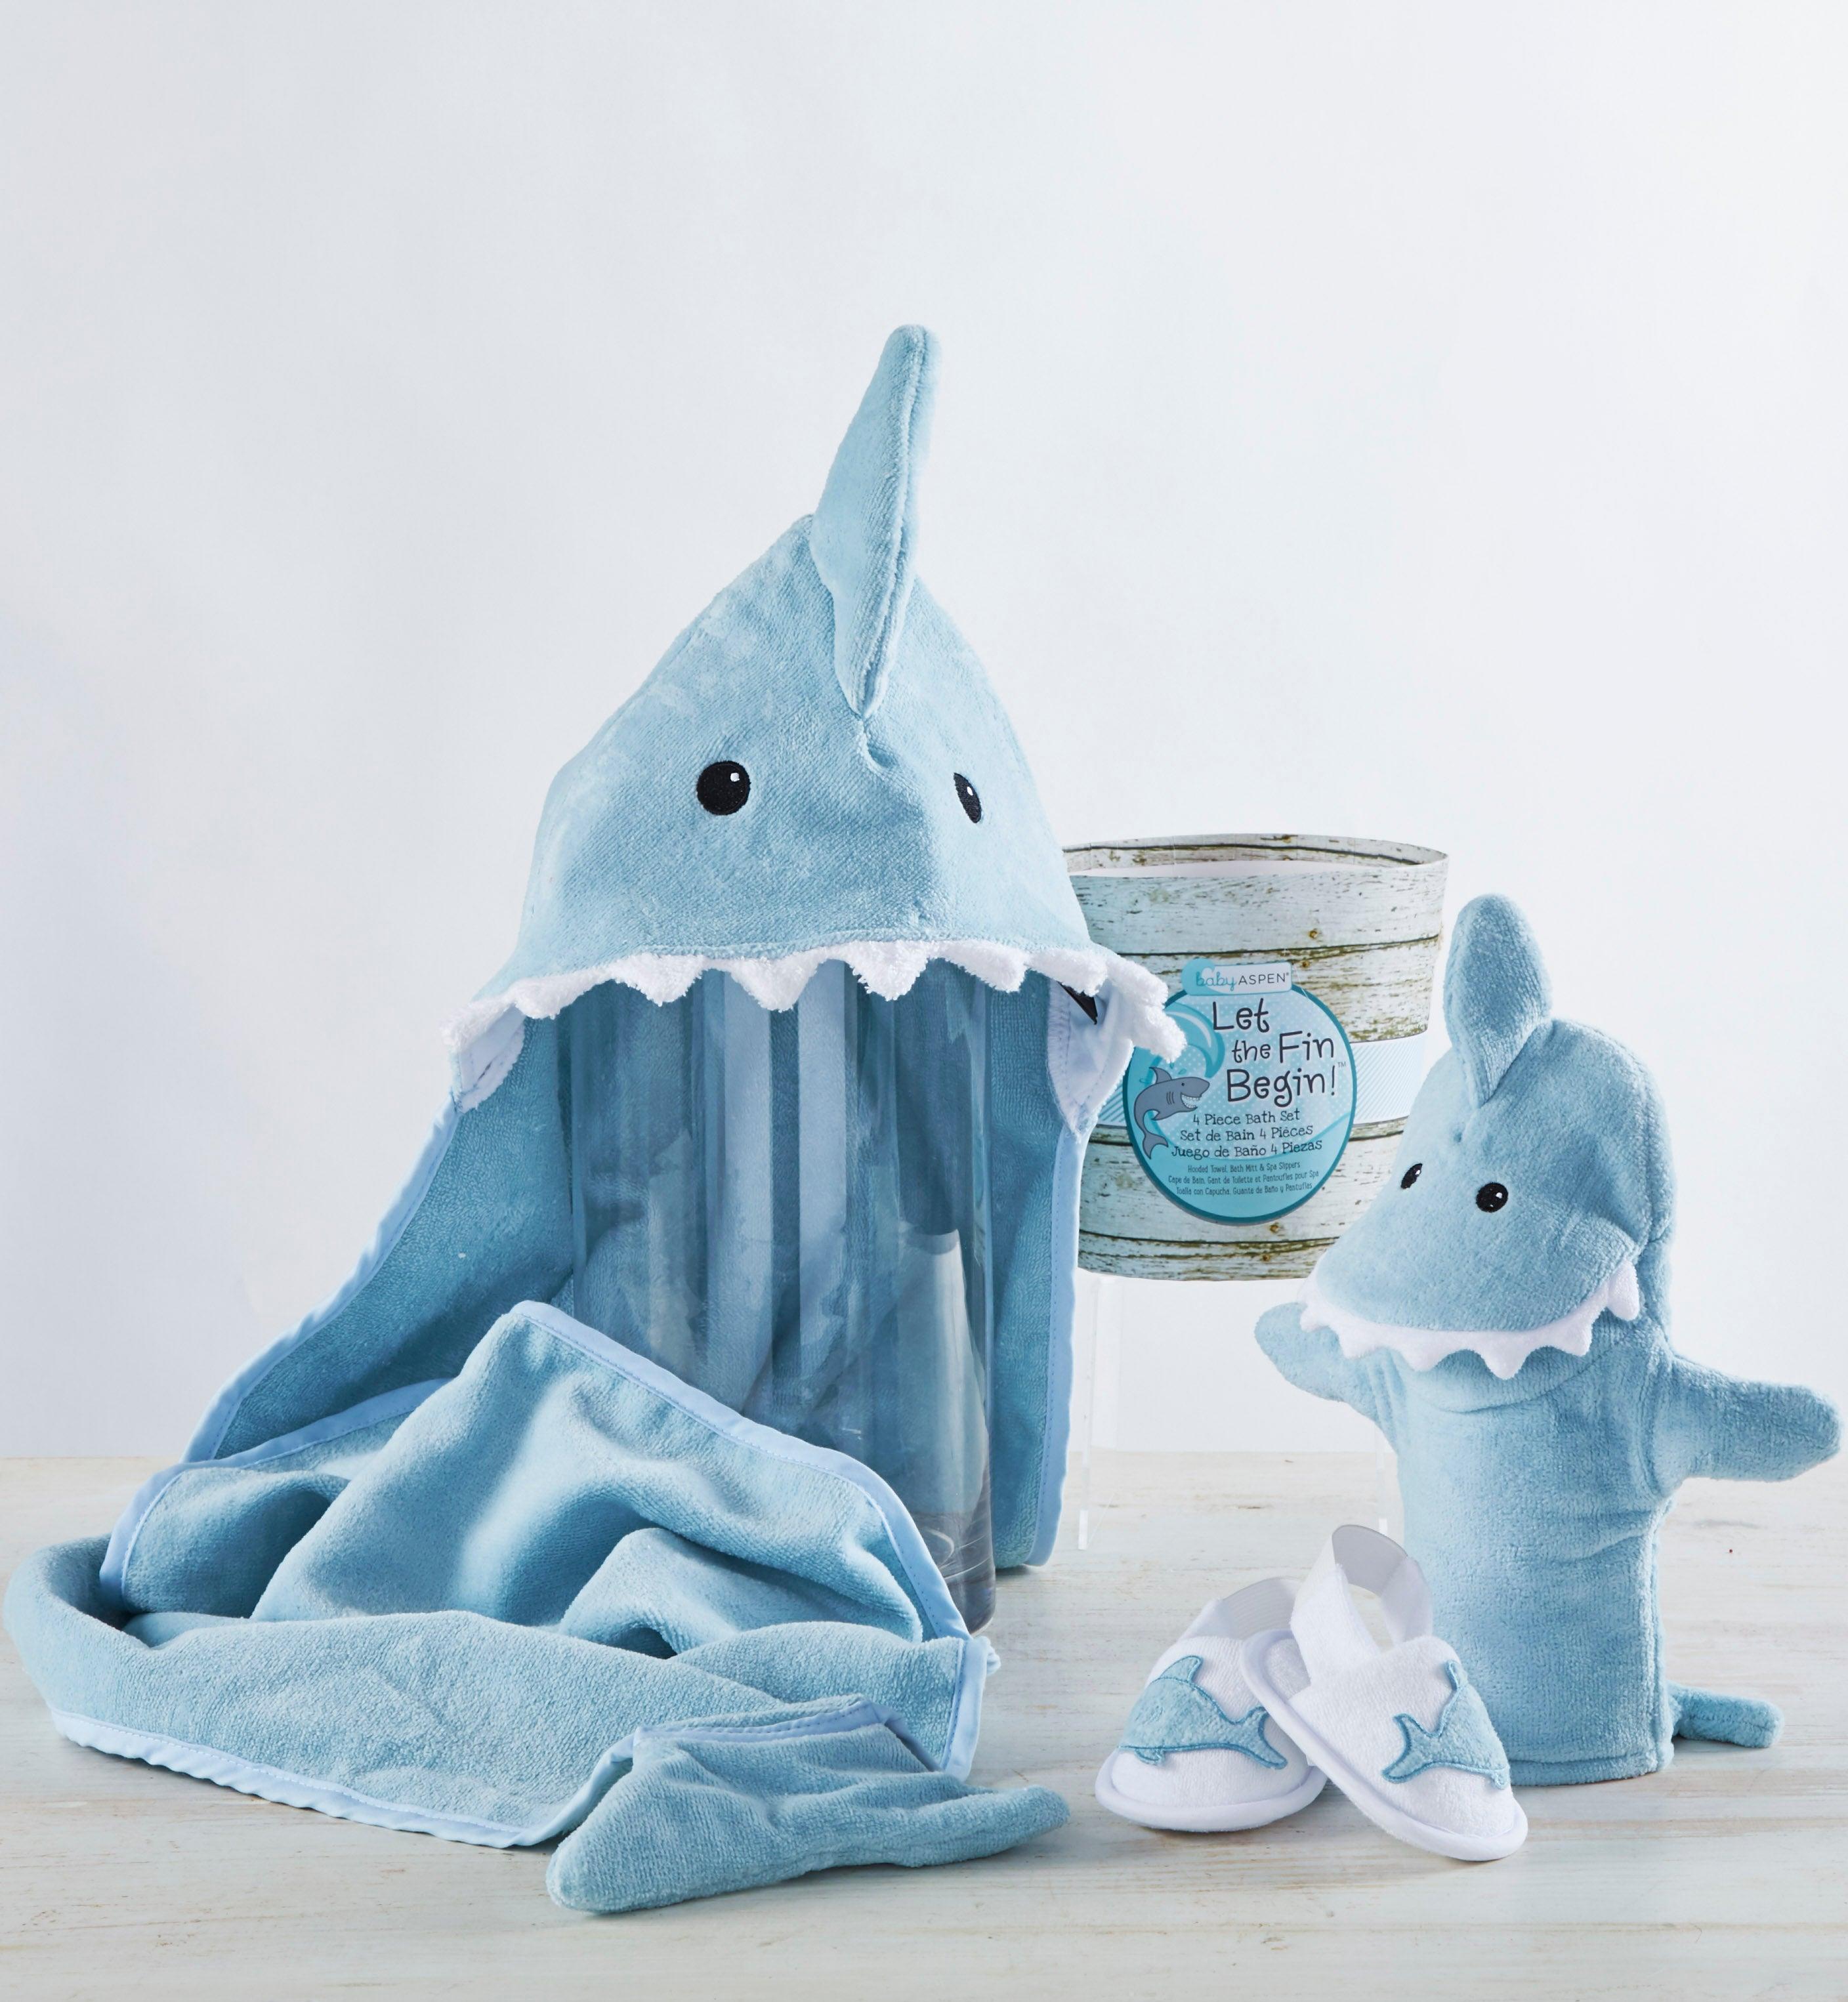 Let the Fin Begin Blue Shark pc Bathtime Gift Set